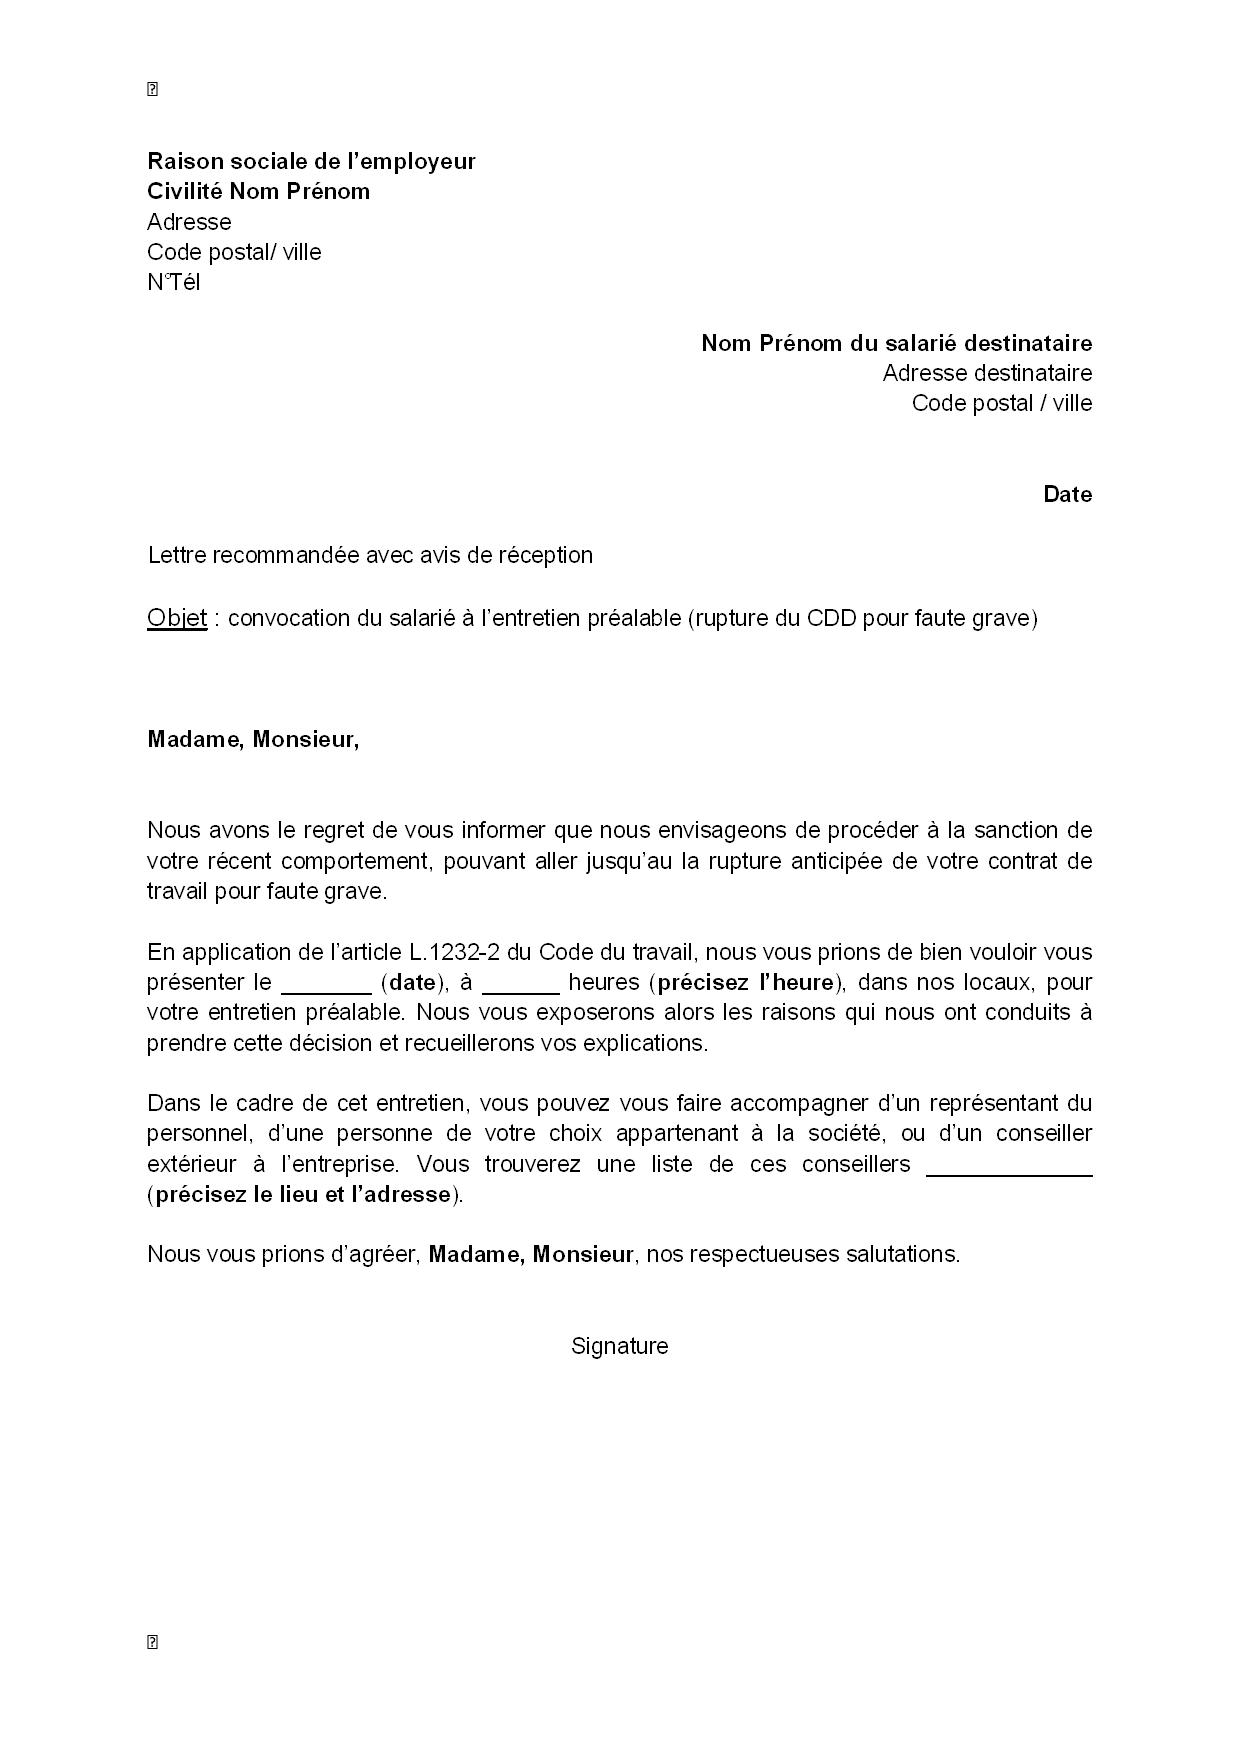 exemple gratuit de lettre convocation salari u00e9  u00e0 entretien